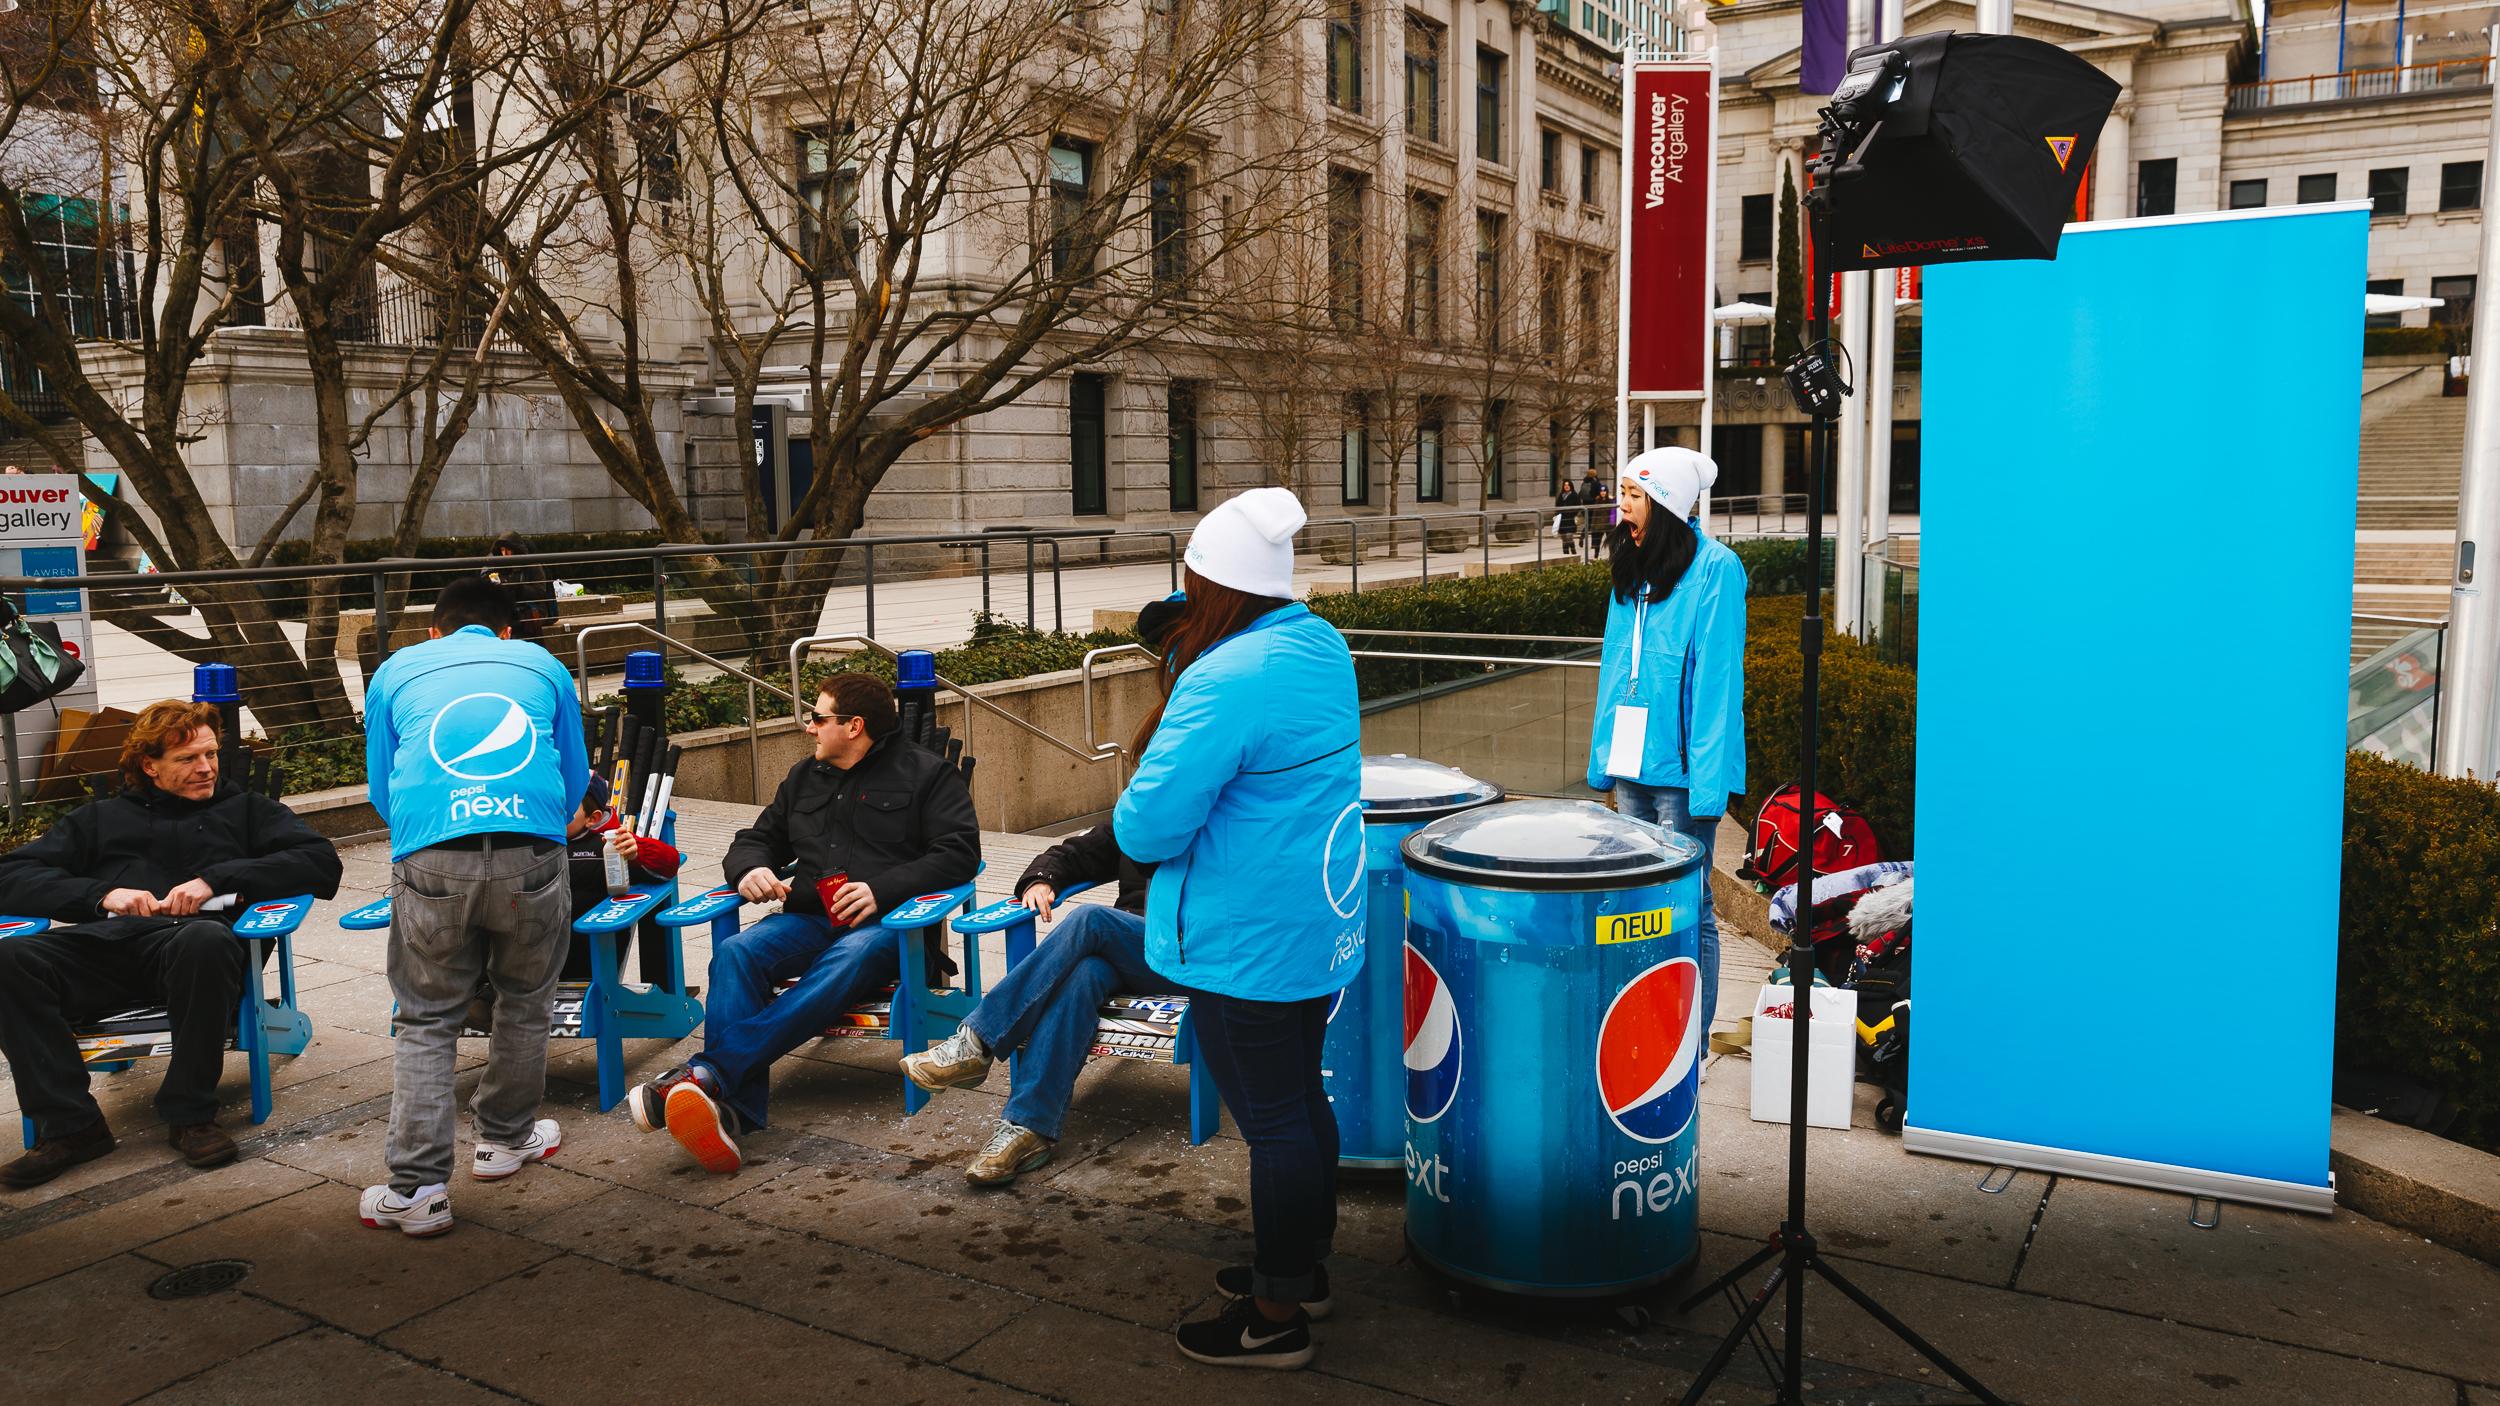 Pepsi Next - Photobooth Setup